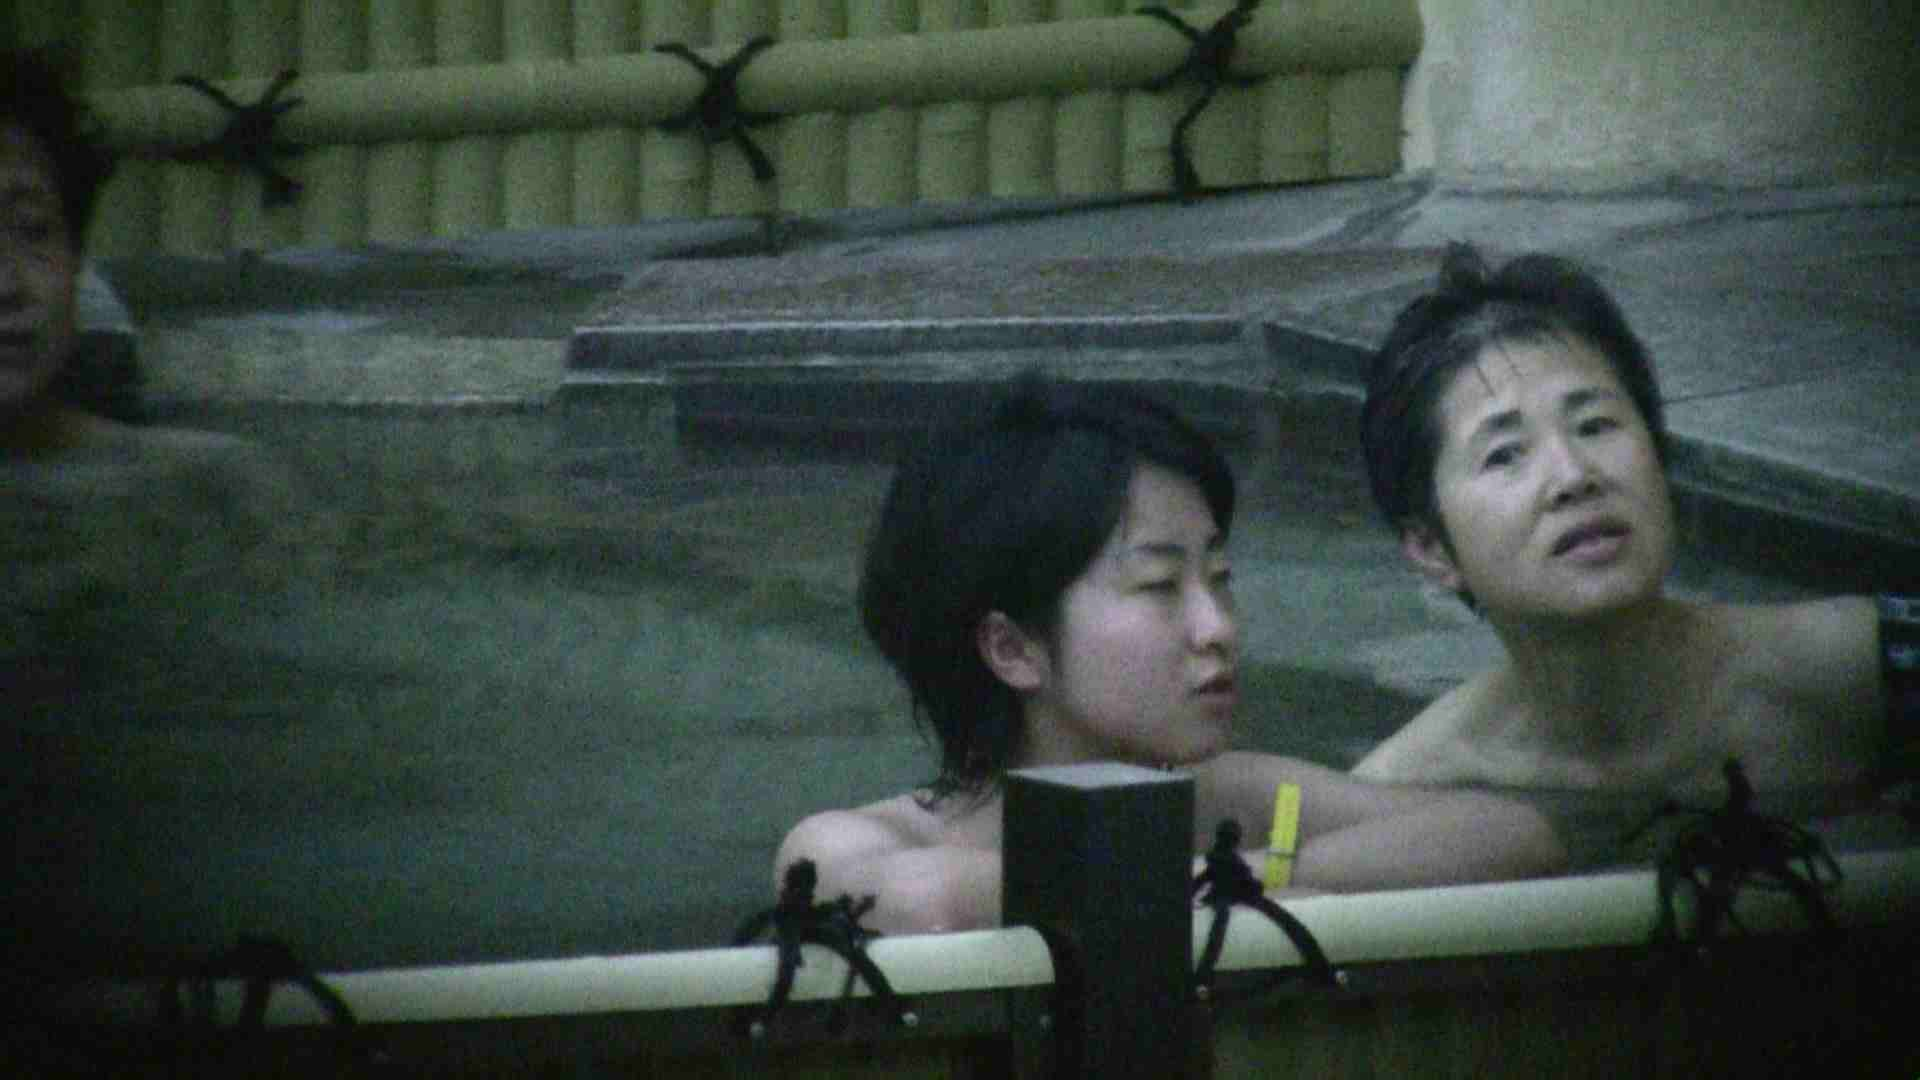 Aquaな露天風呂Vol.112 0 | 0  68連発 33